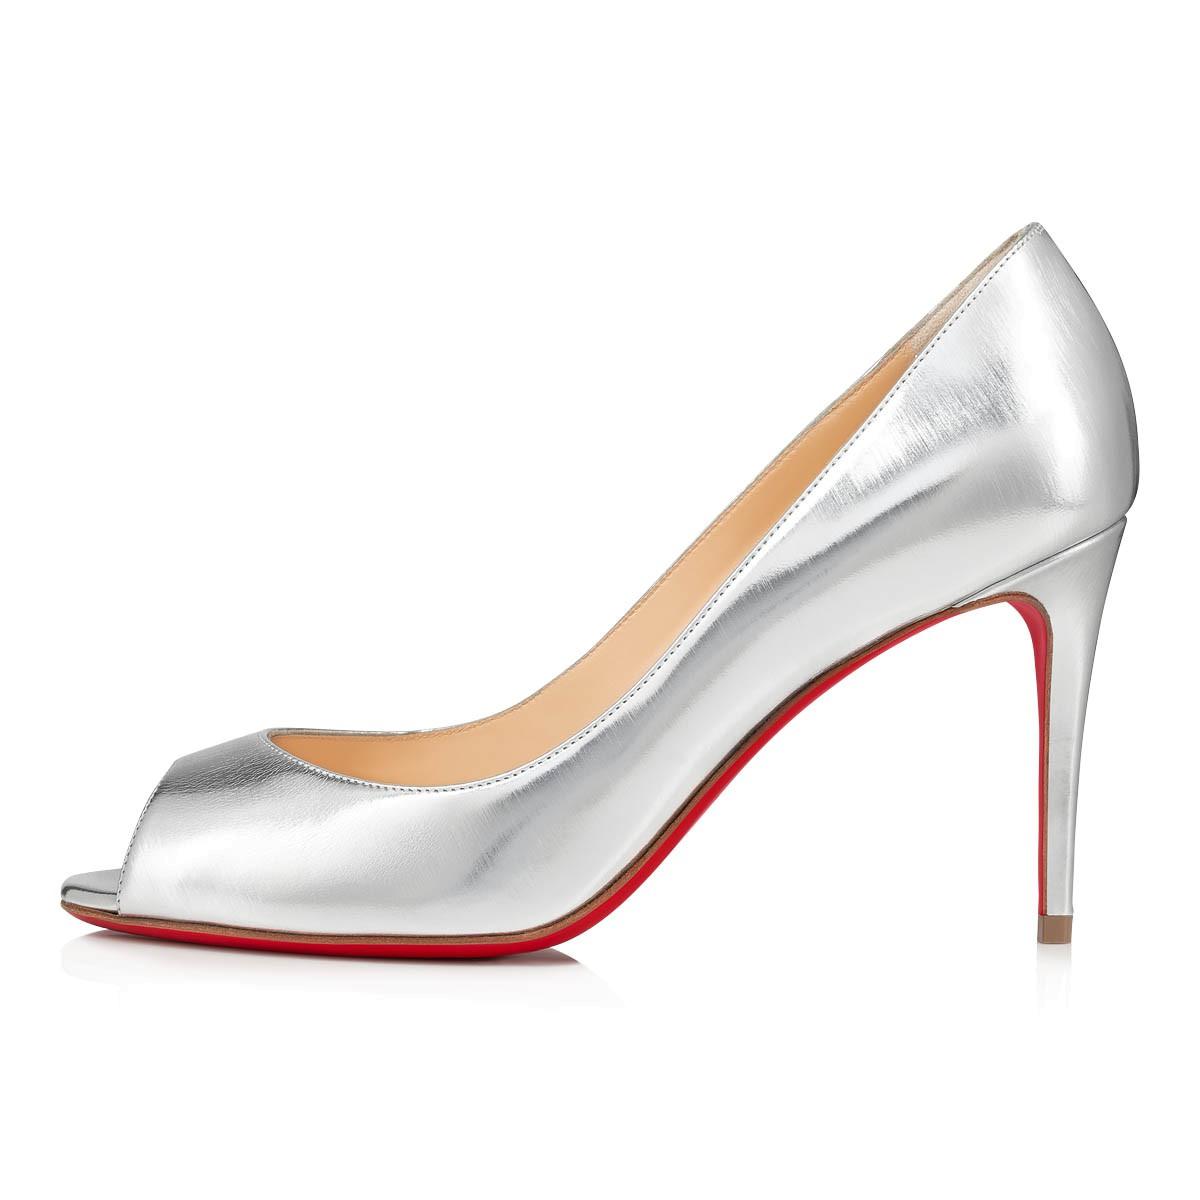 Shoes - Roxane - Christian Louboutin